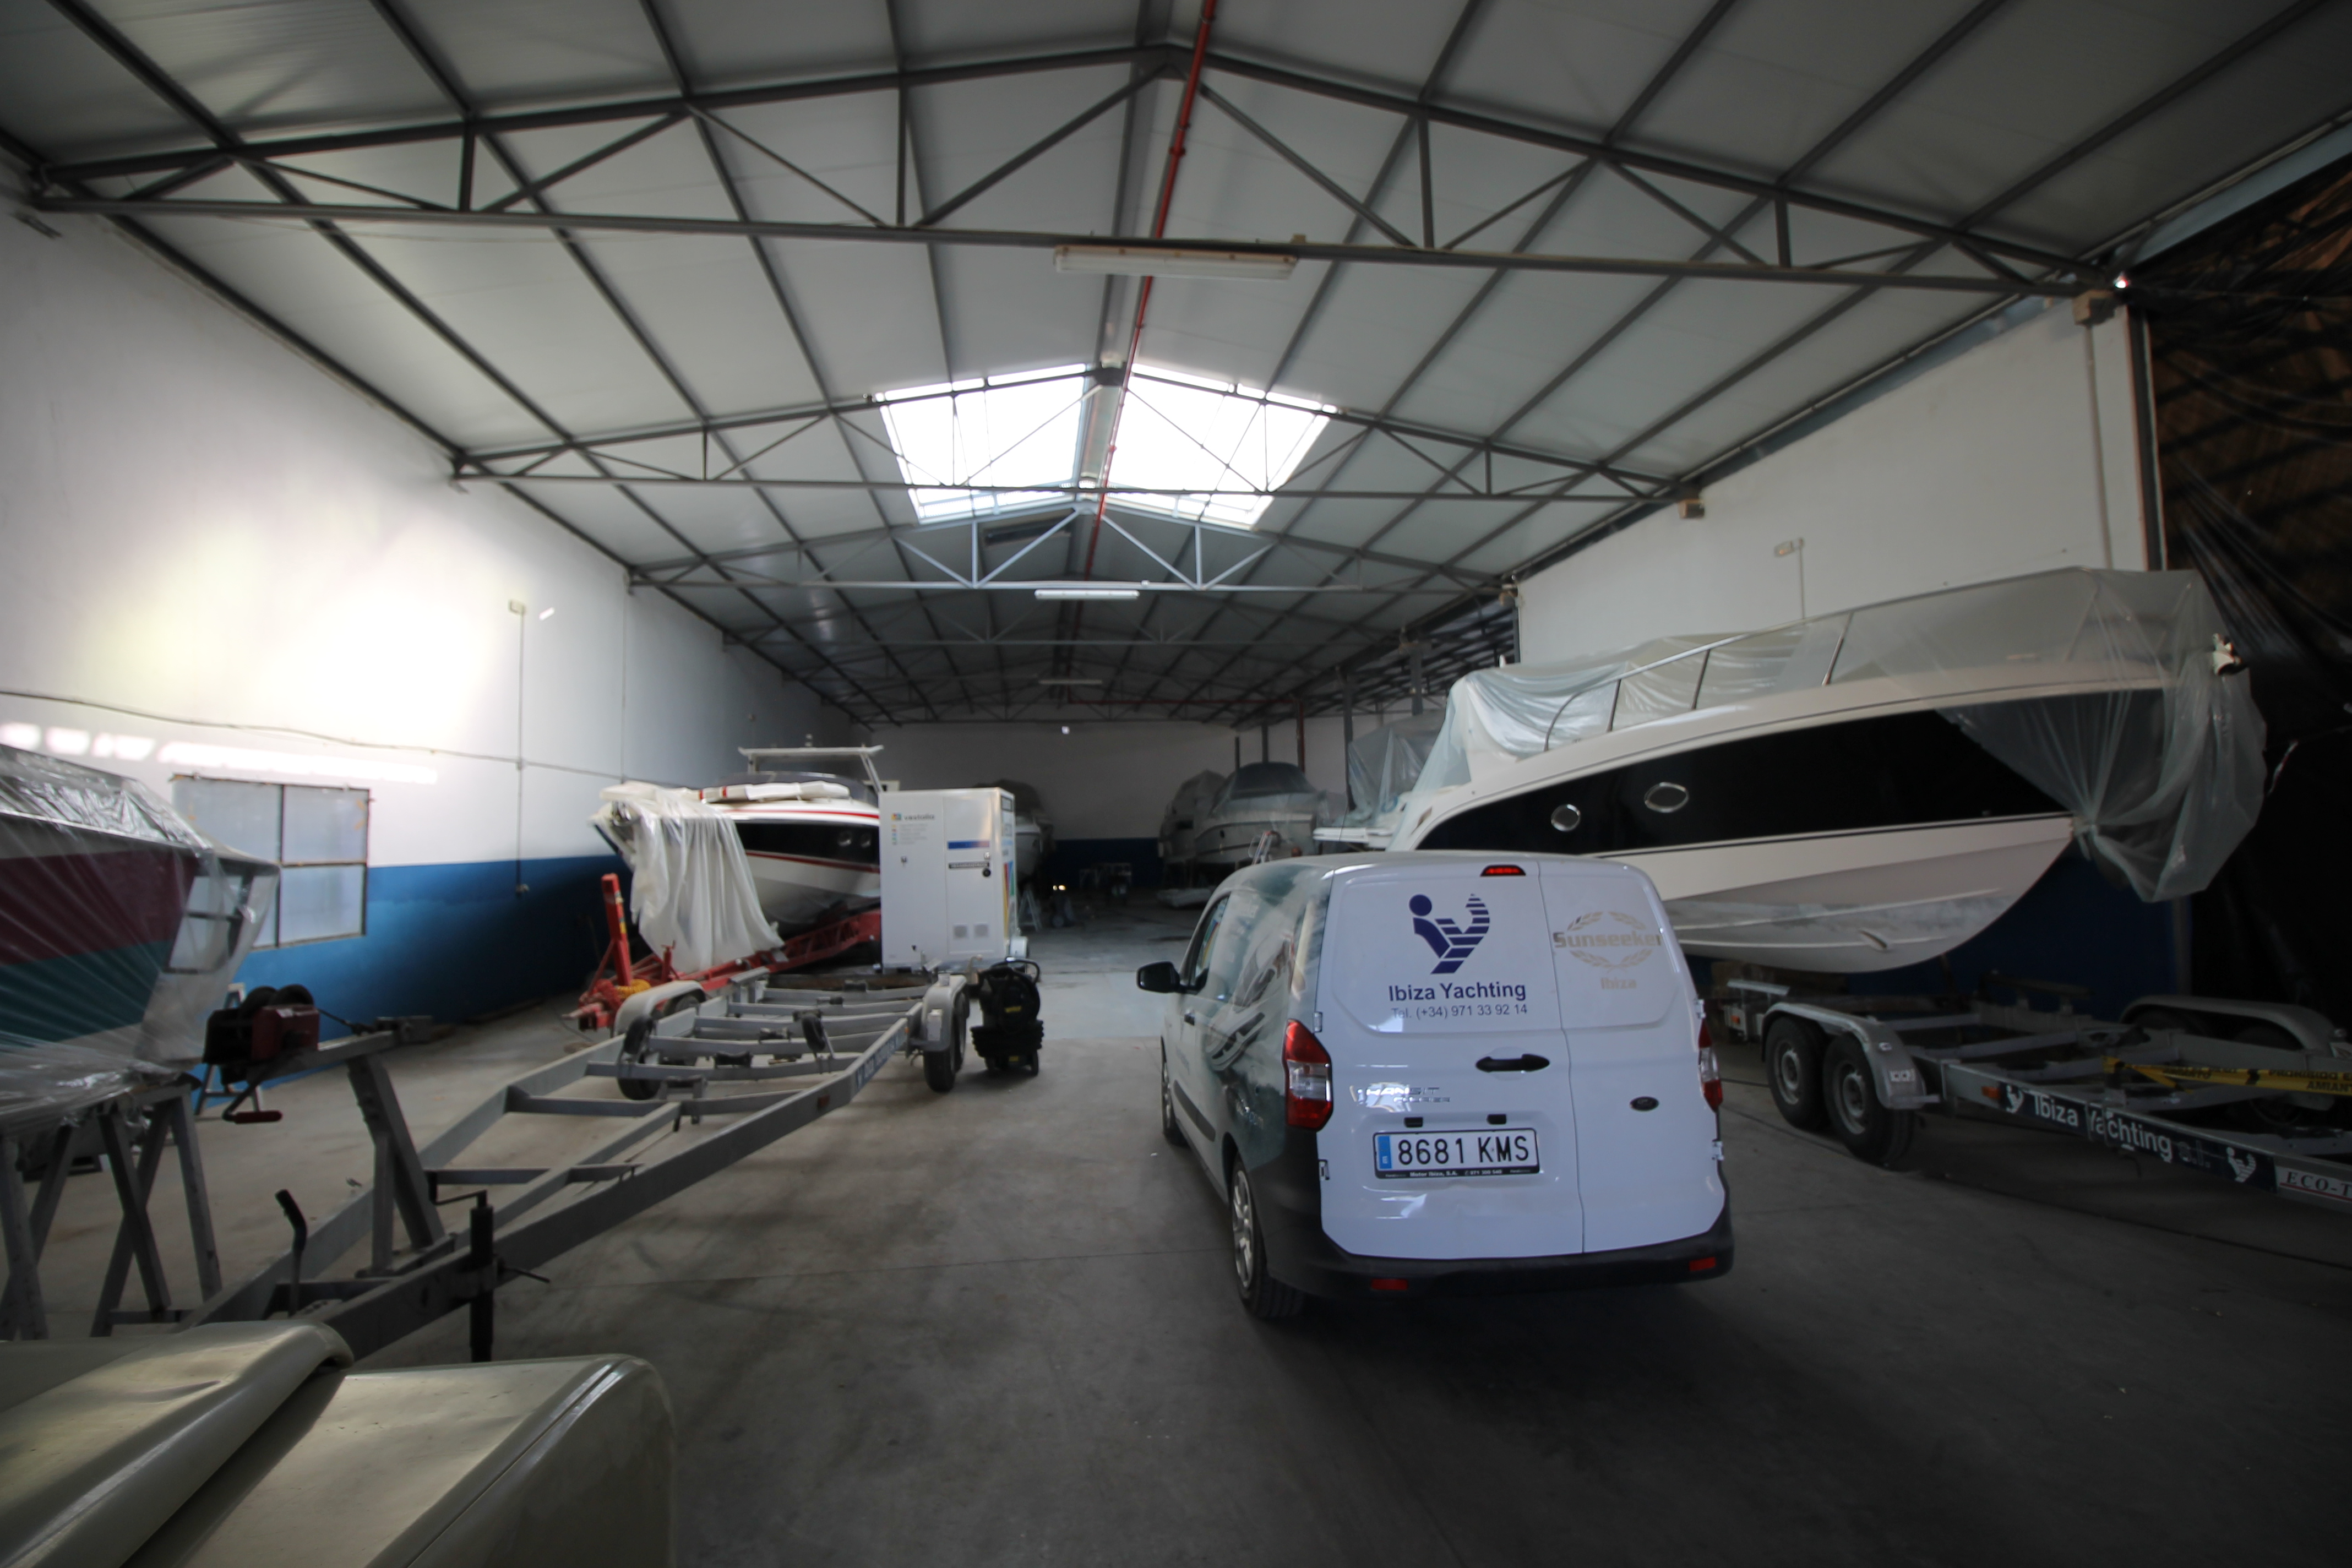 Ibiza Yachting Nave